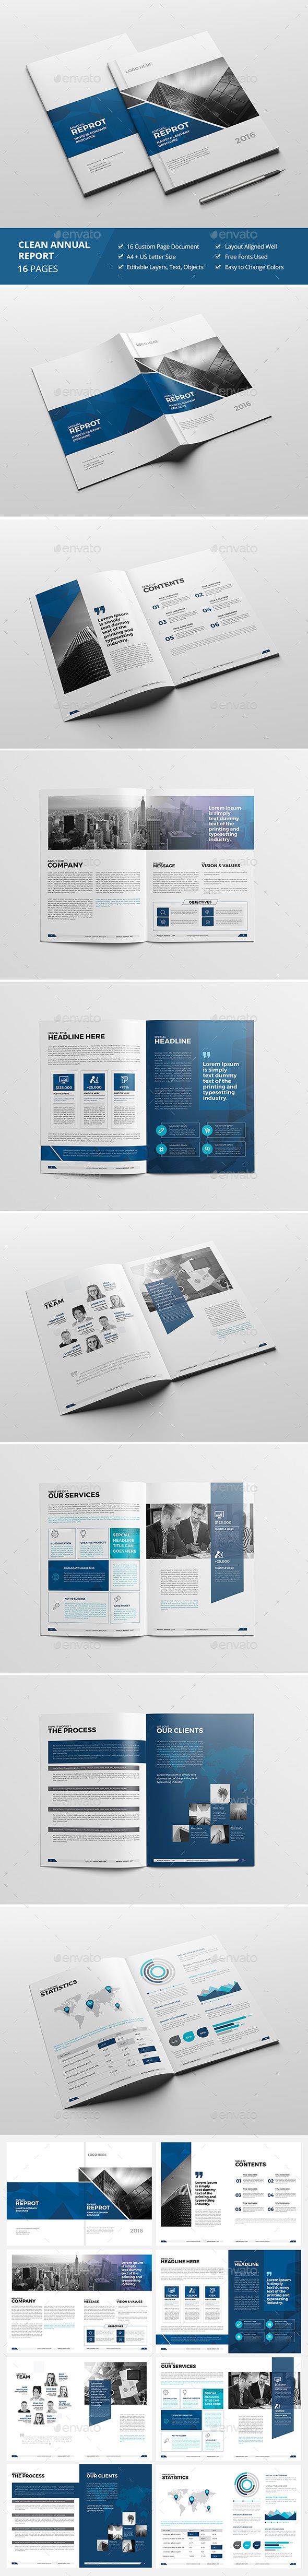 brochure format ideas alan noscrapleftbehind co